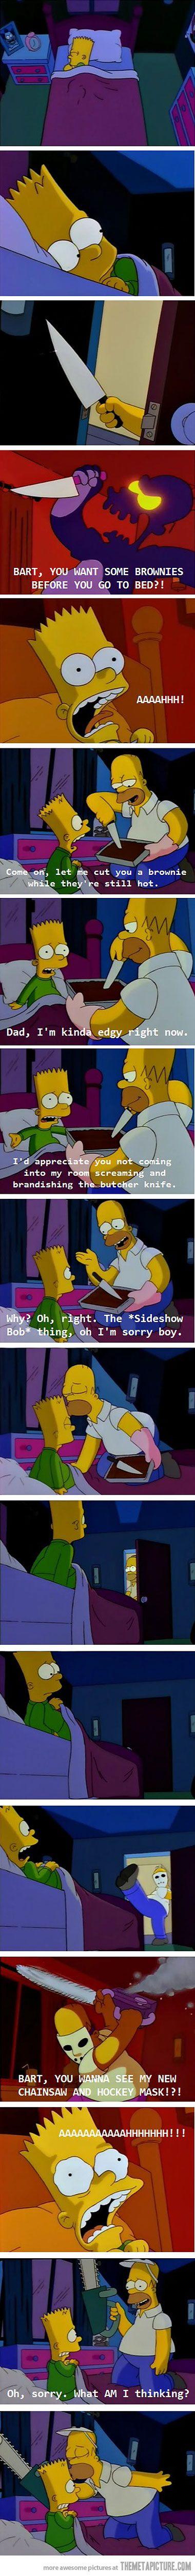 Parenting Level: Homer Simpson